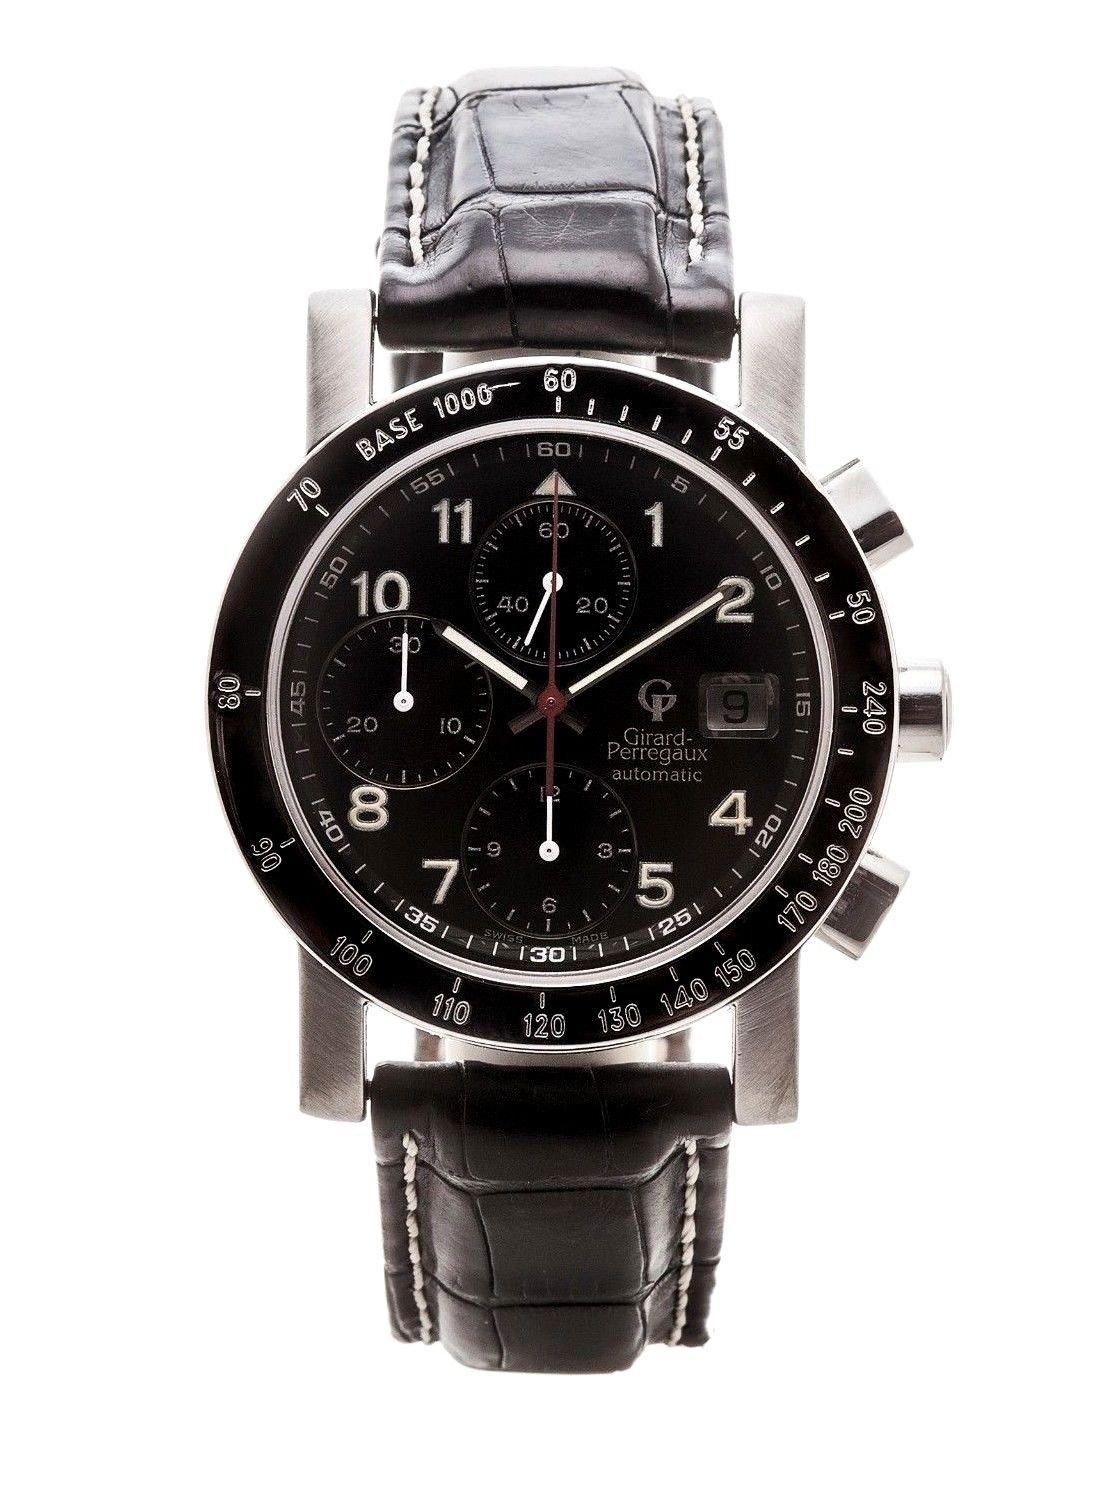 Girard Perragaux Perregaux automatic-self-wind mens Watch GP7000 (Certified Pre-owned)